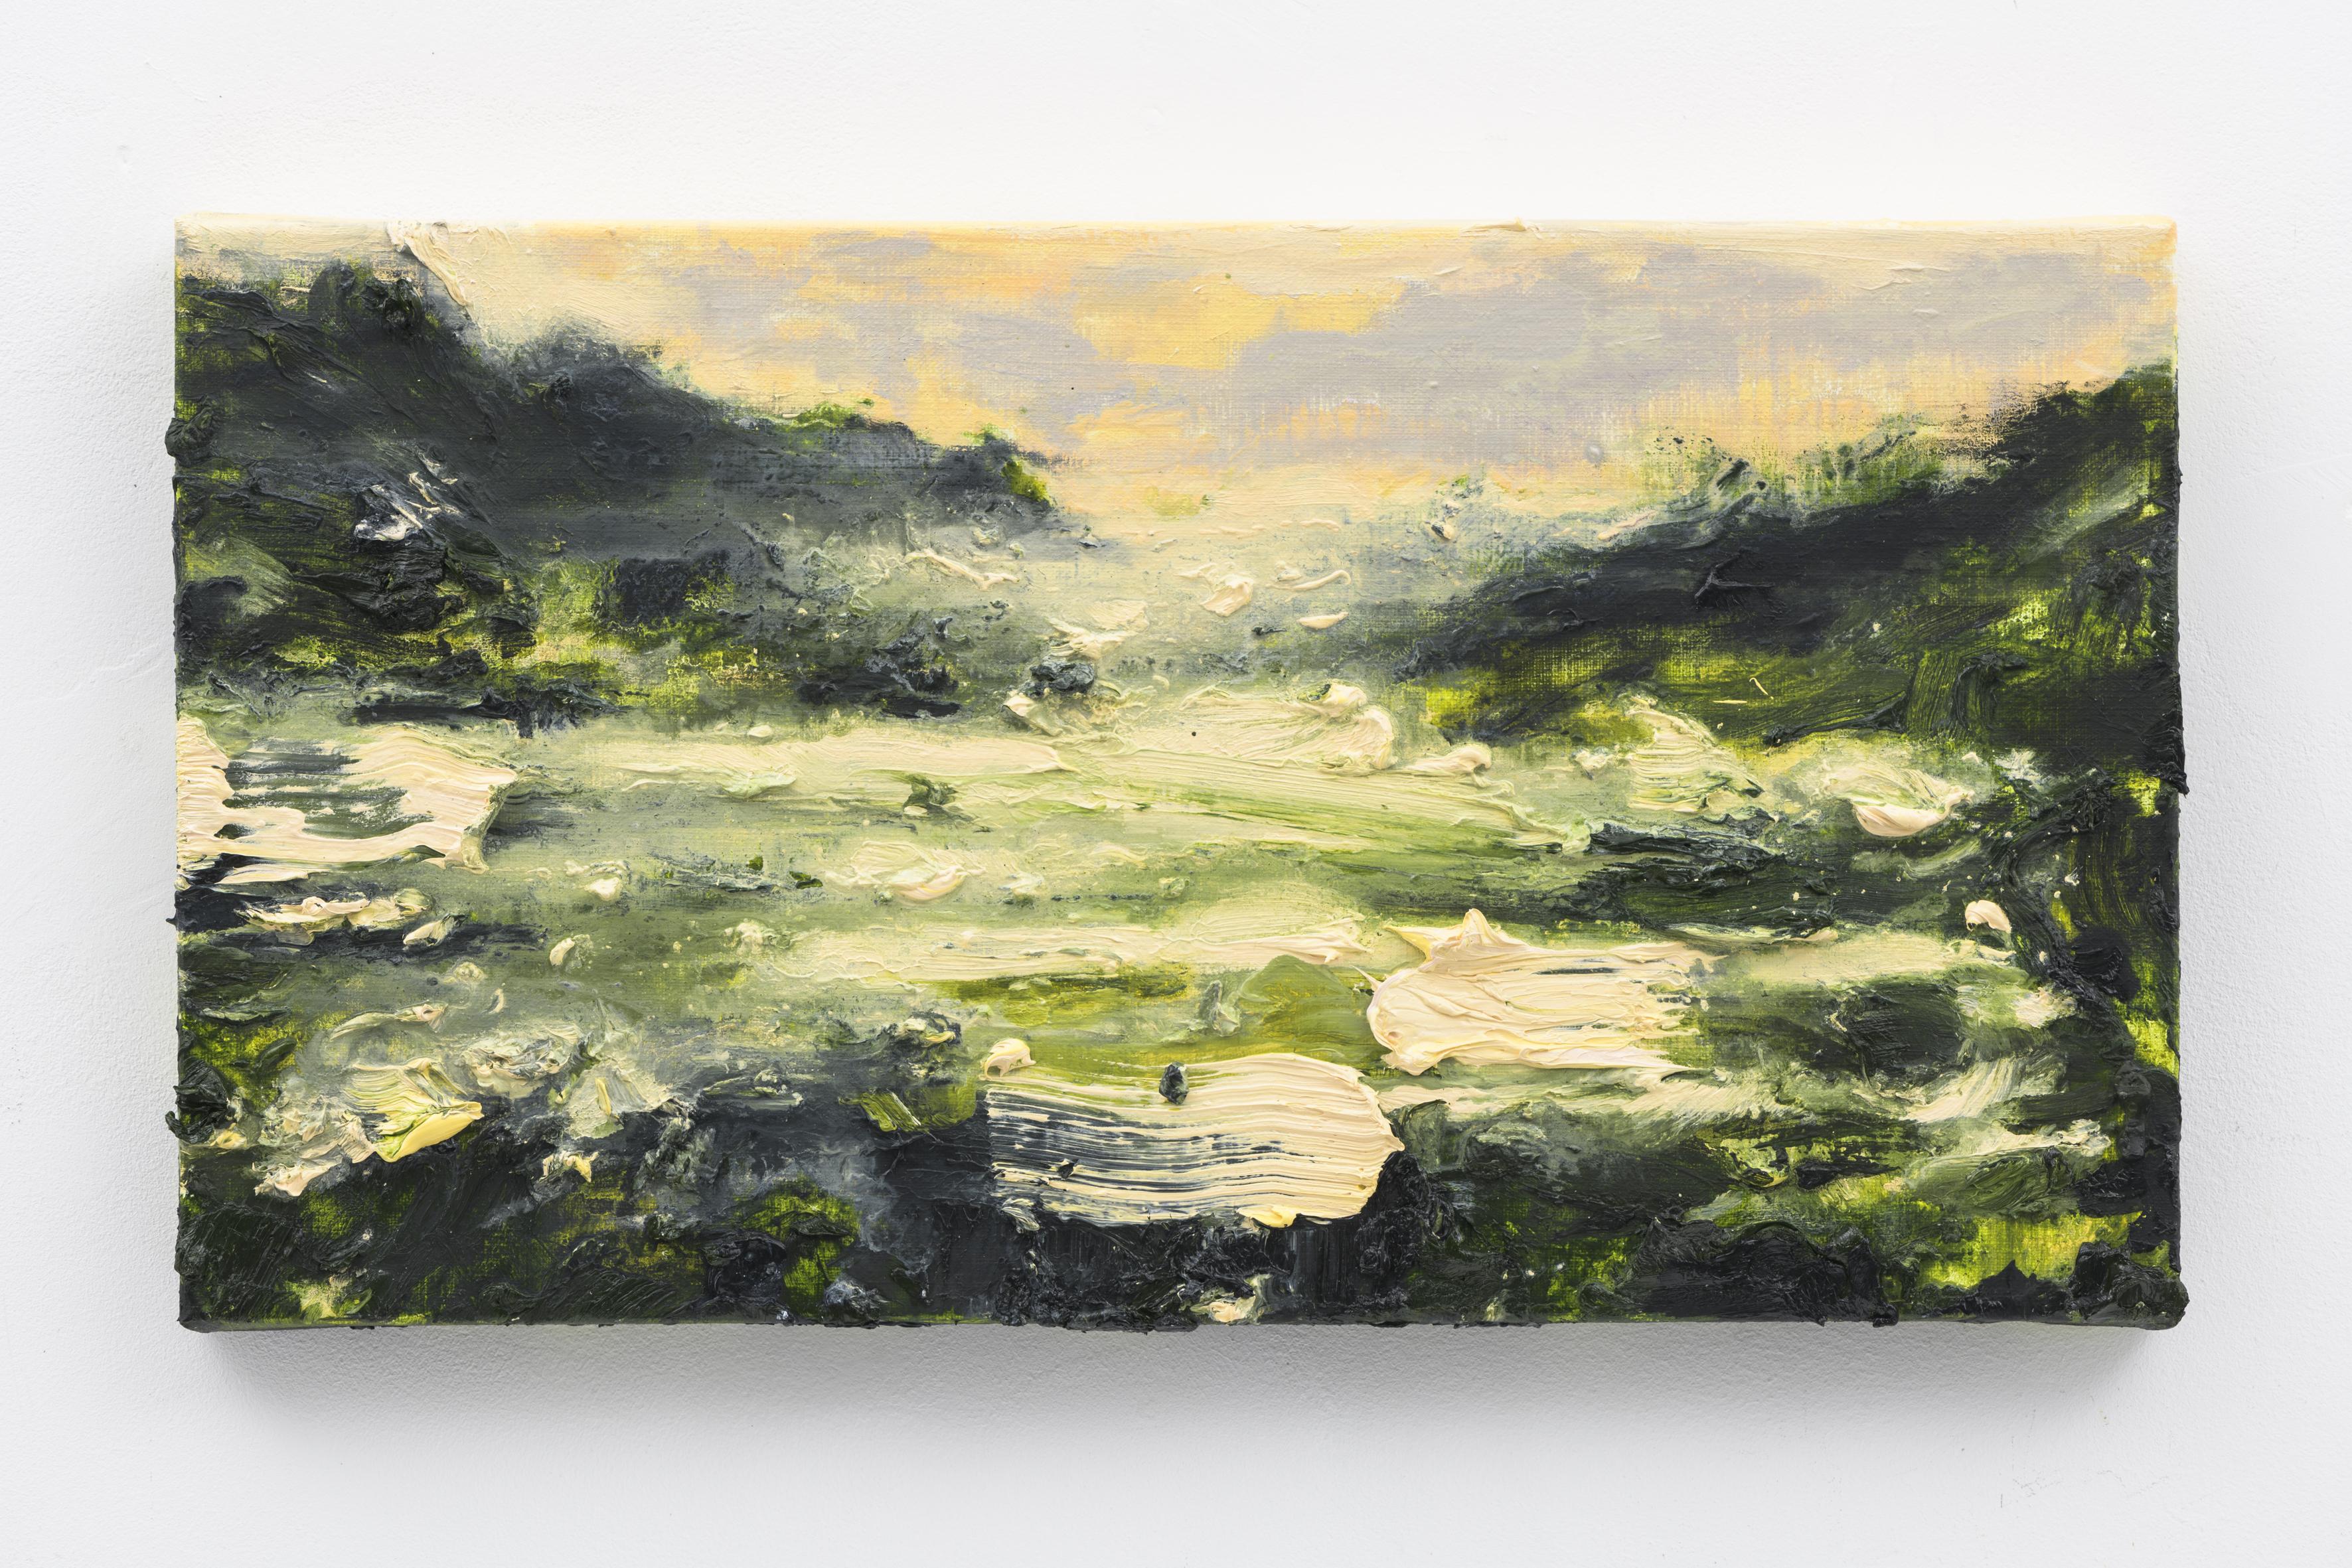 """Oude Buisse Heide III"" 25 x 45 cm. oil on linen 2017 (Air Van GoghHuis)"